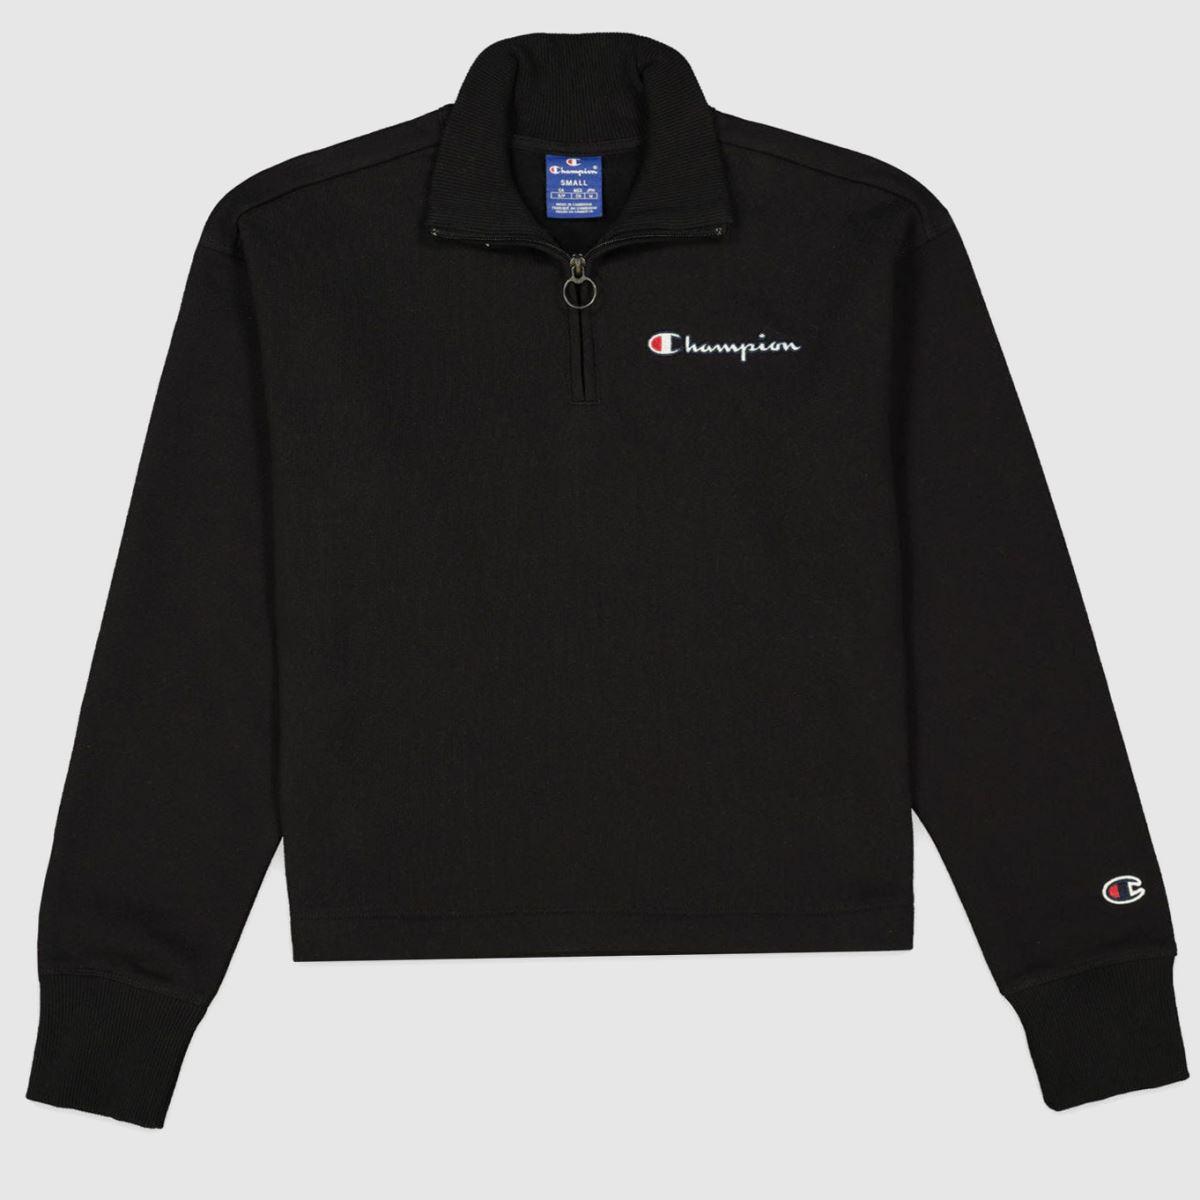 Champion Black Half Zipped Sweatshirt